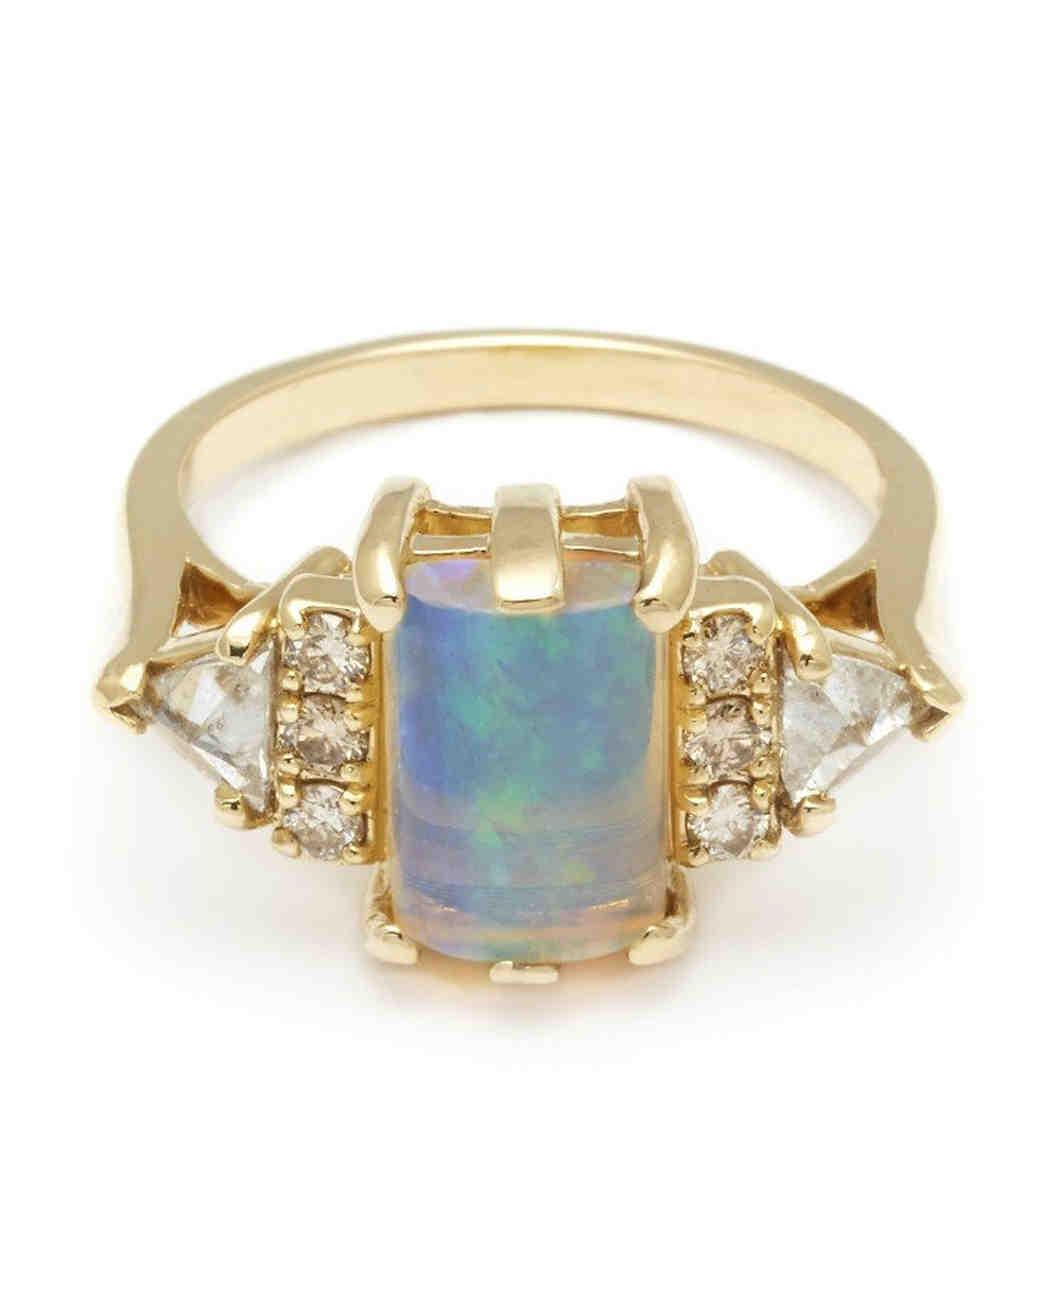 anna sheffield opal engagement ring - Opal Wedding Ring